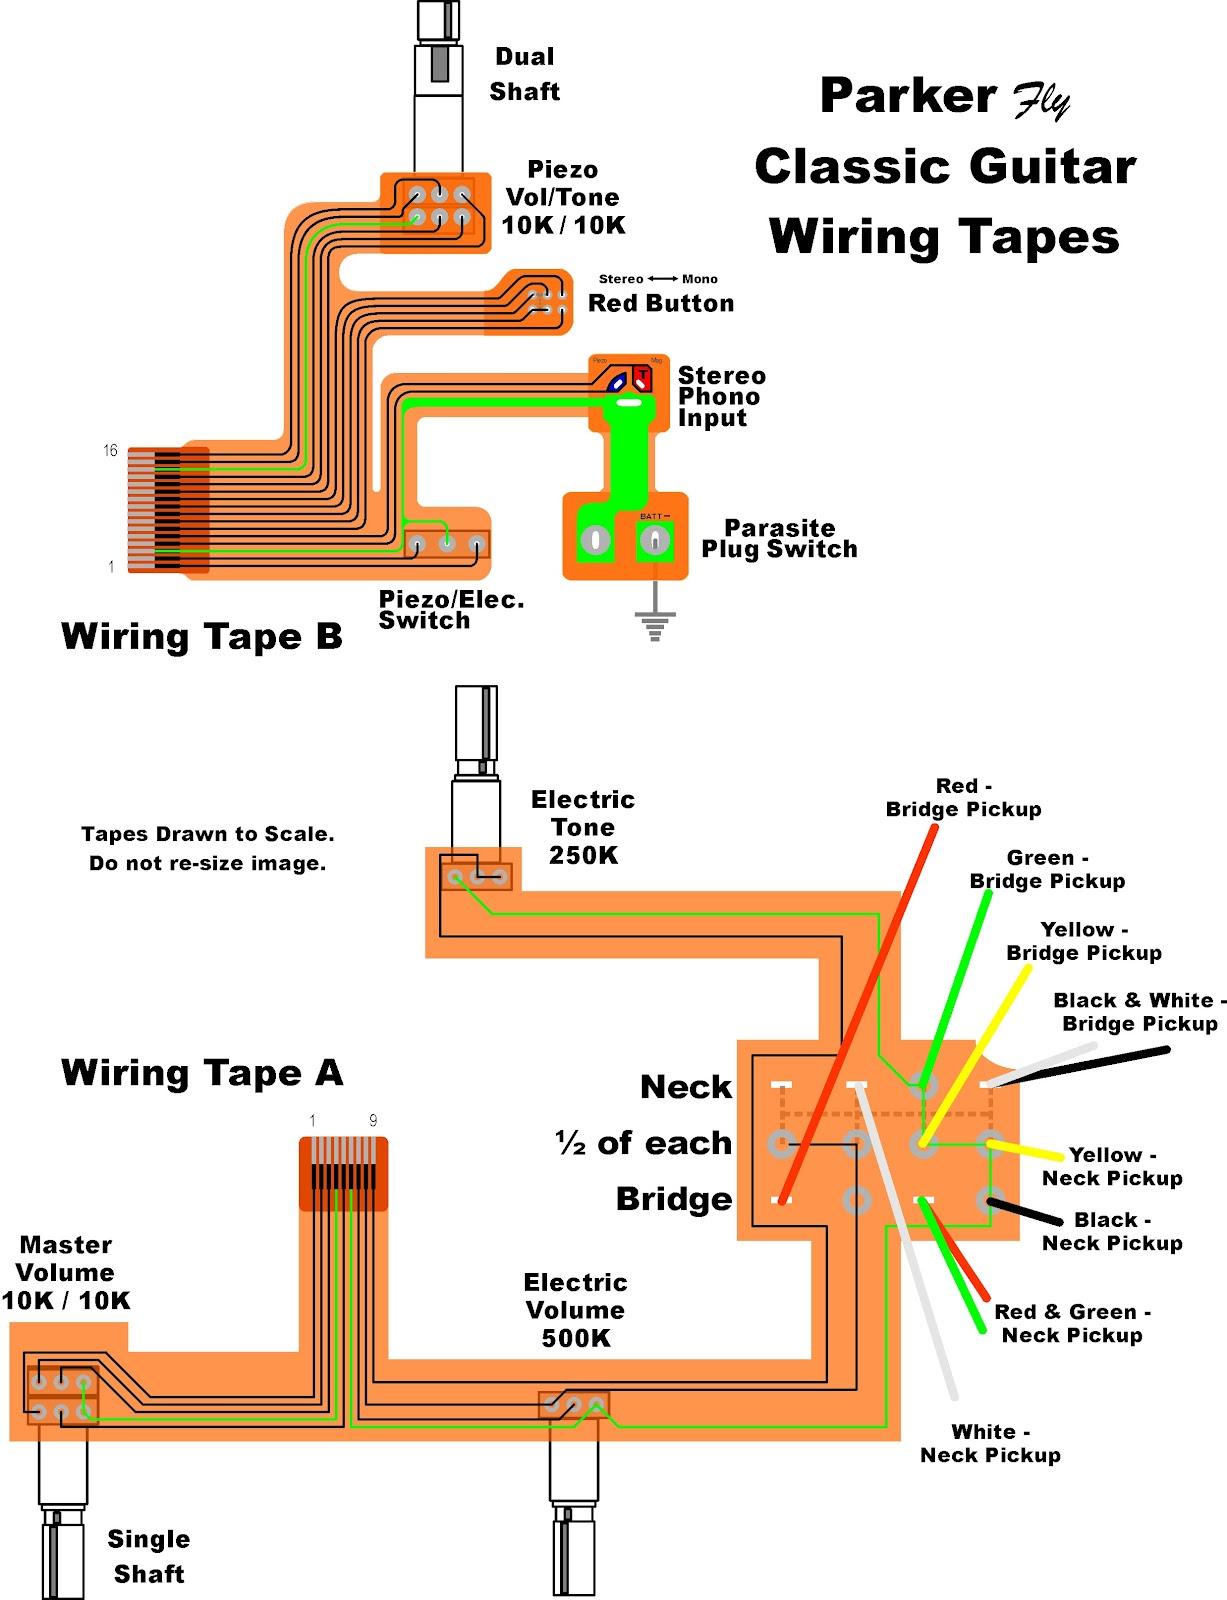 wiring gitar maen gitar rh pranandika blogspot com Guitar Wiring Diagrams 3 Pickups Guitar Coil Tap Wiring Diagrams